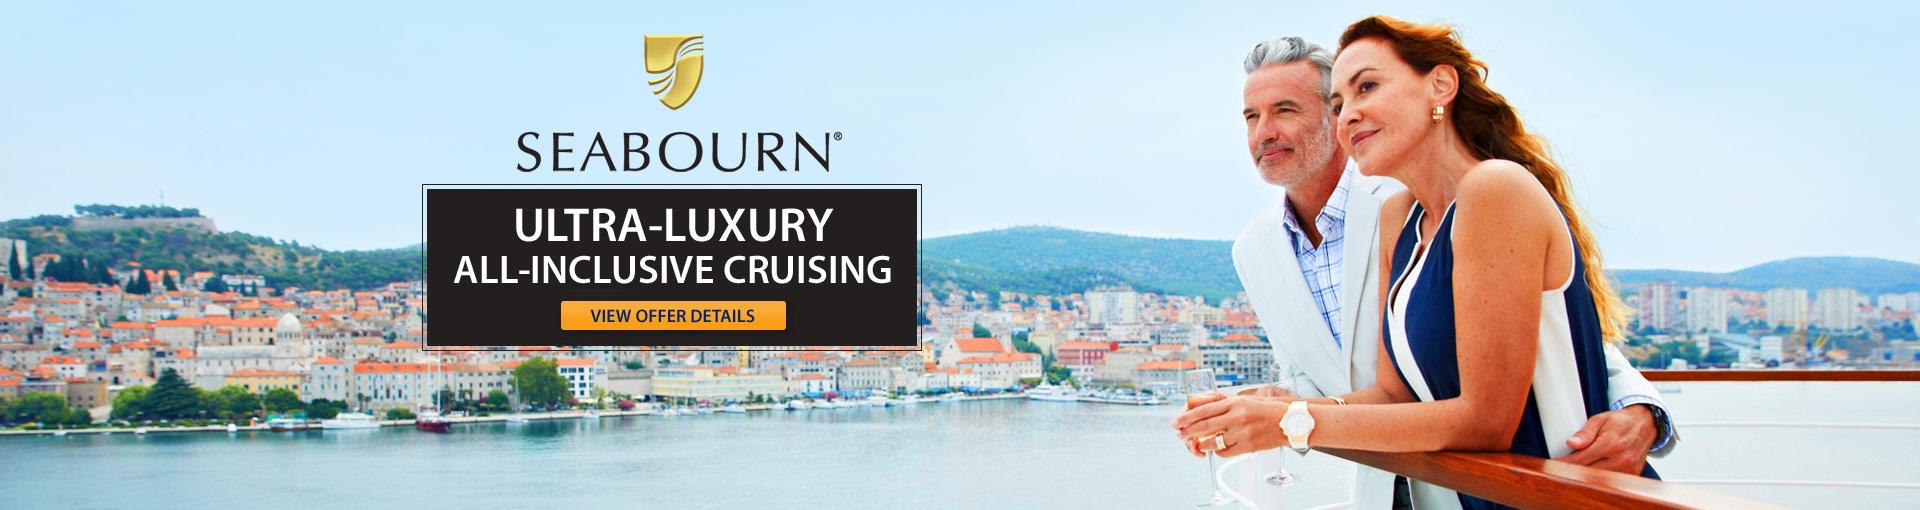 Seabourn Ultra-Luxury Cruises